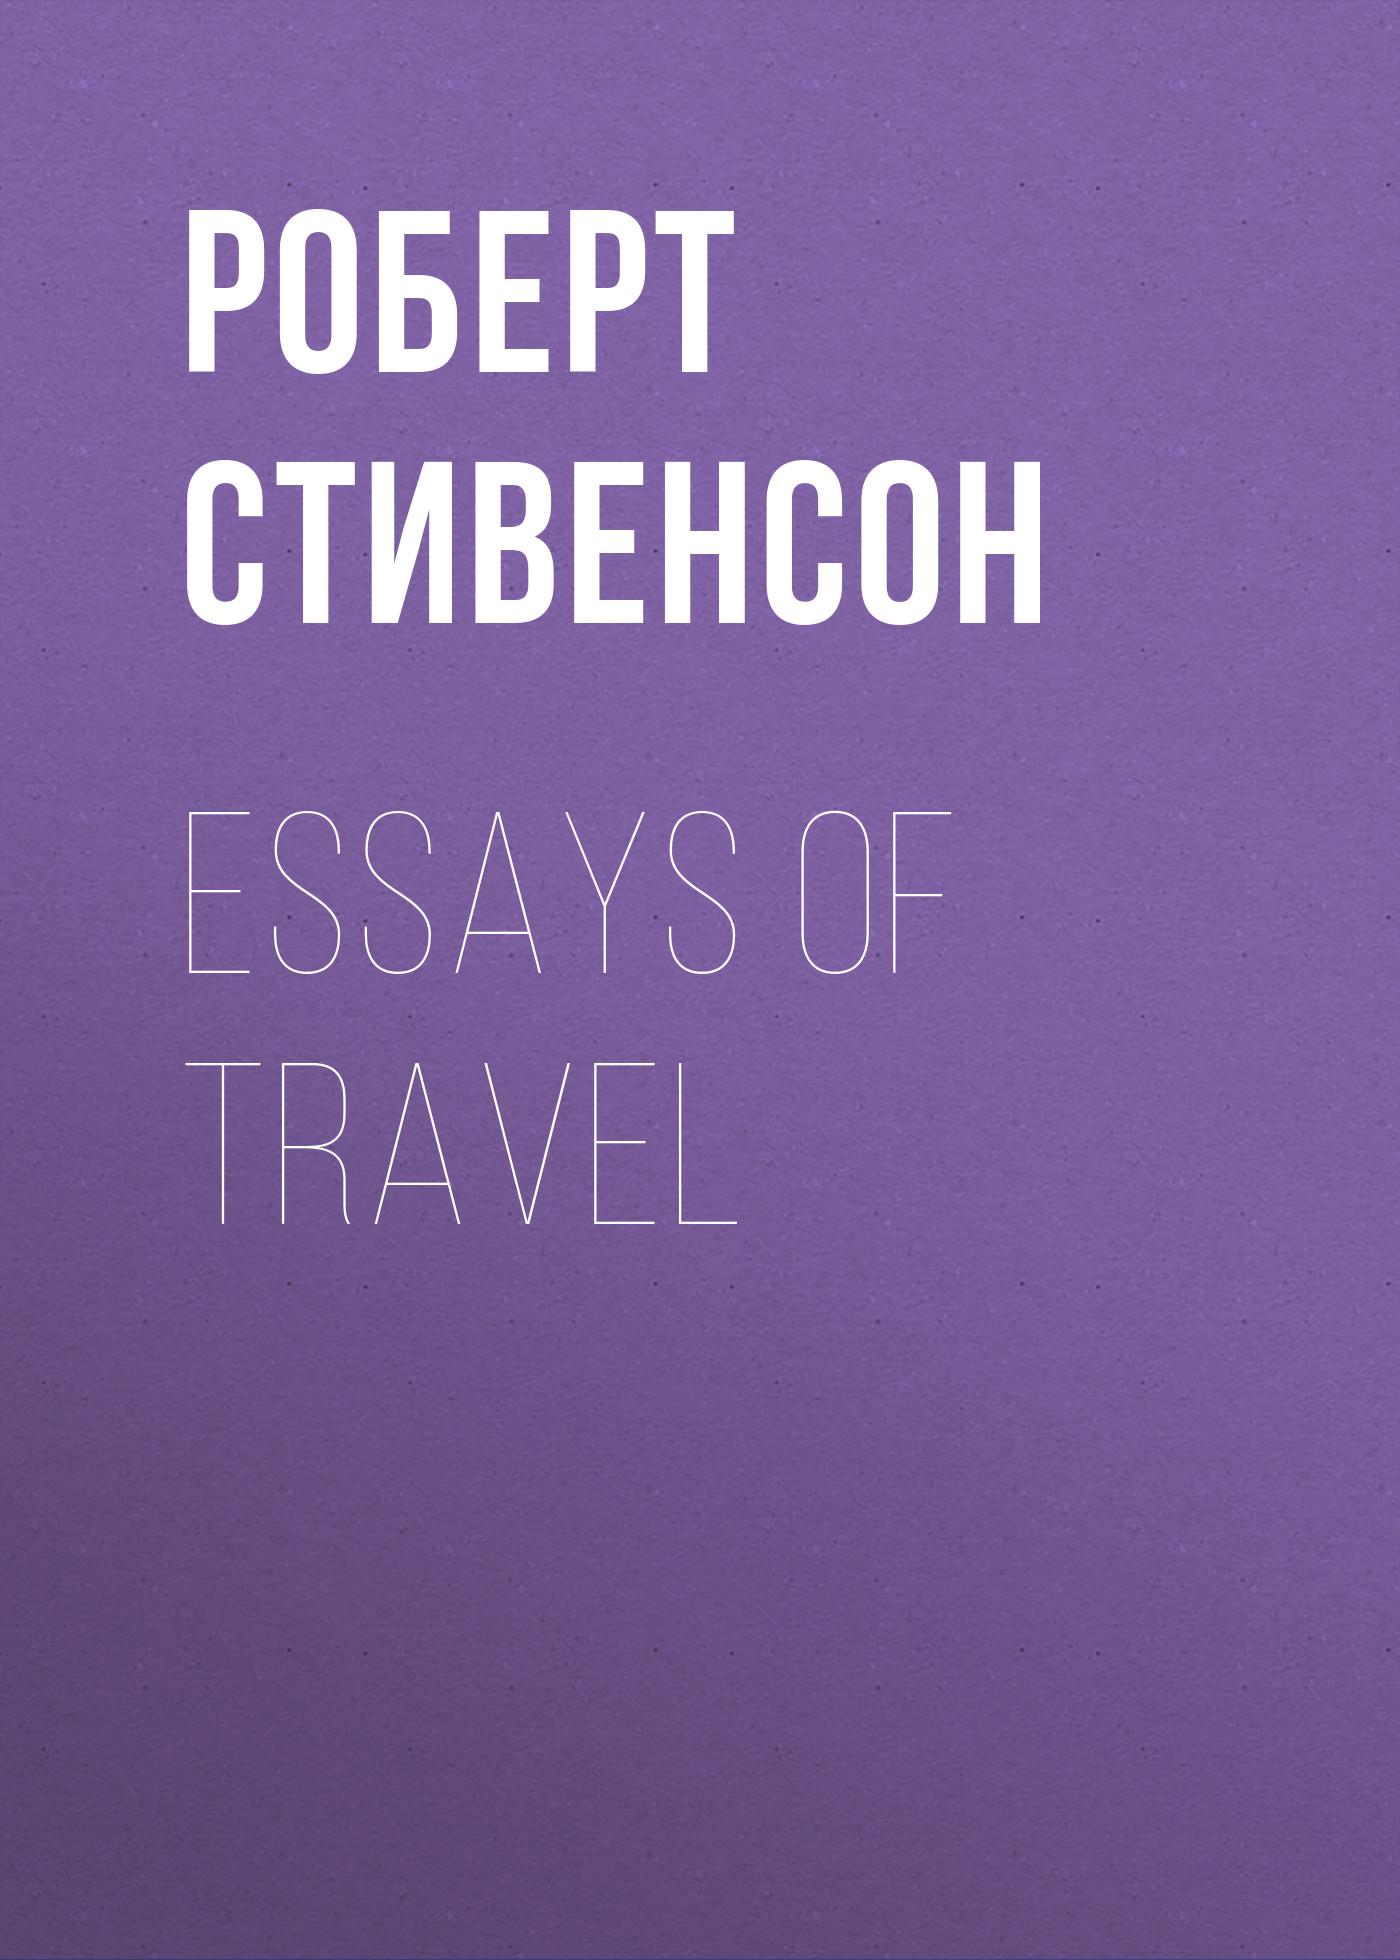 все цены на Роберт Льюис Стивенсон Essays of Travel онлайн